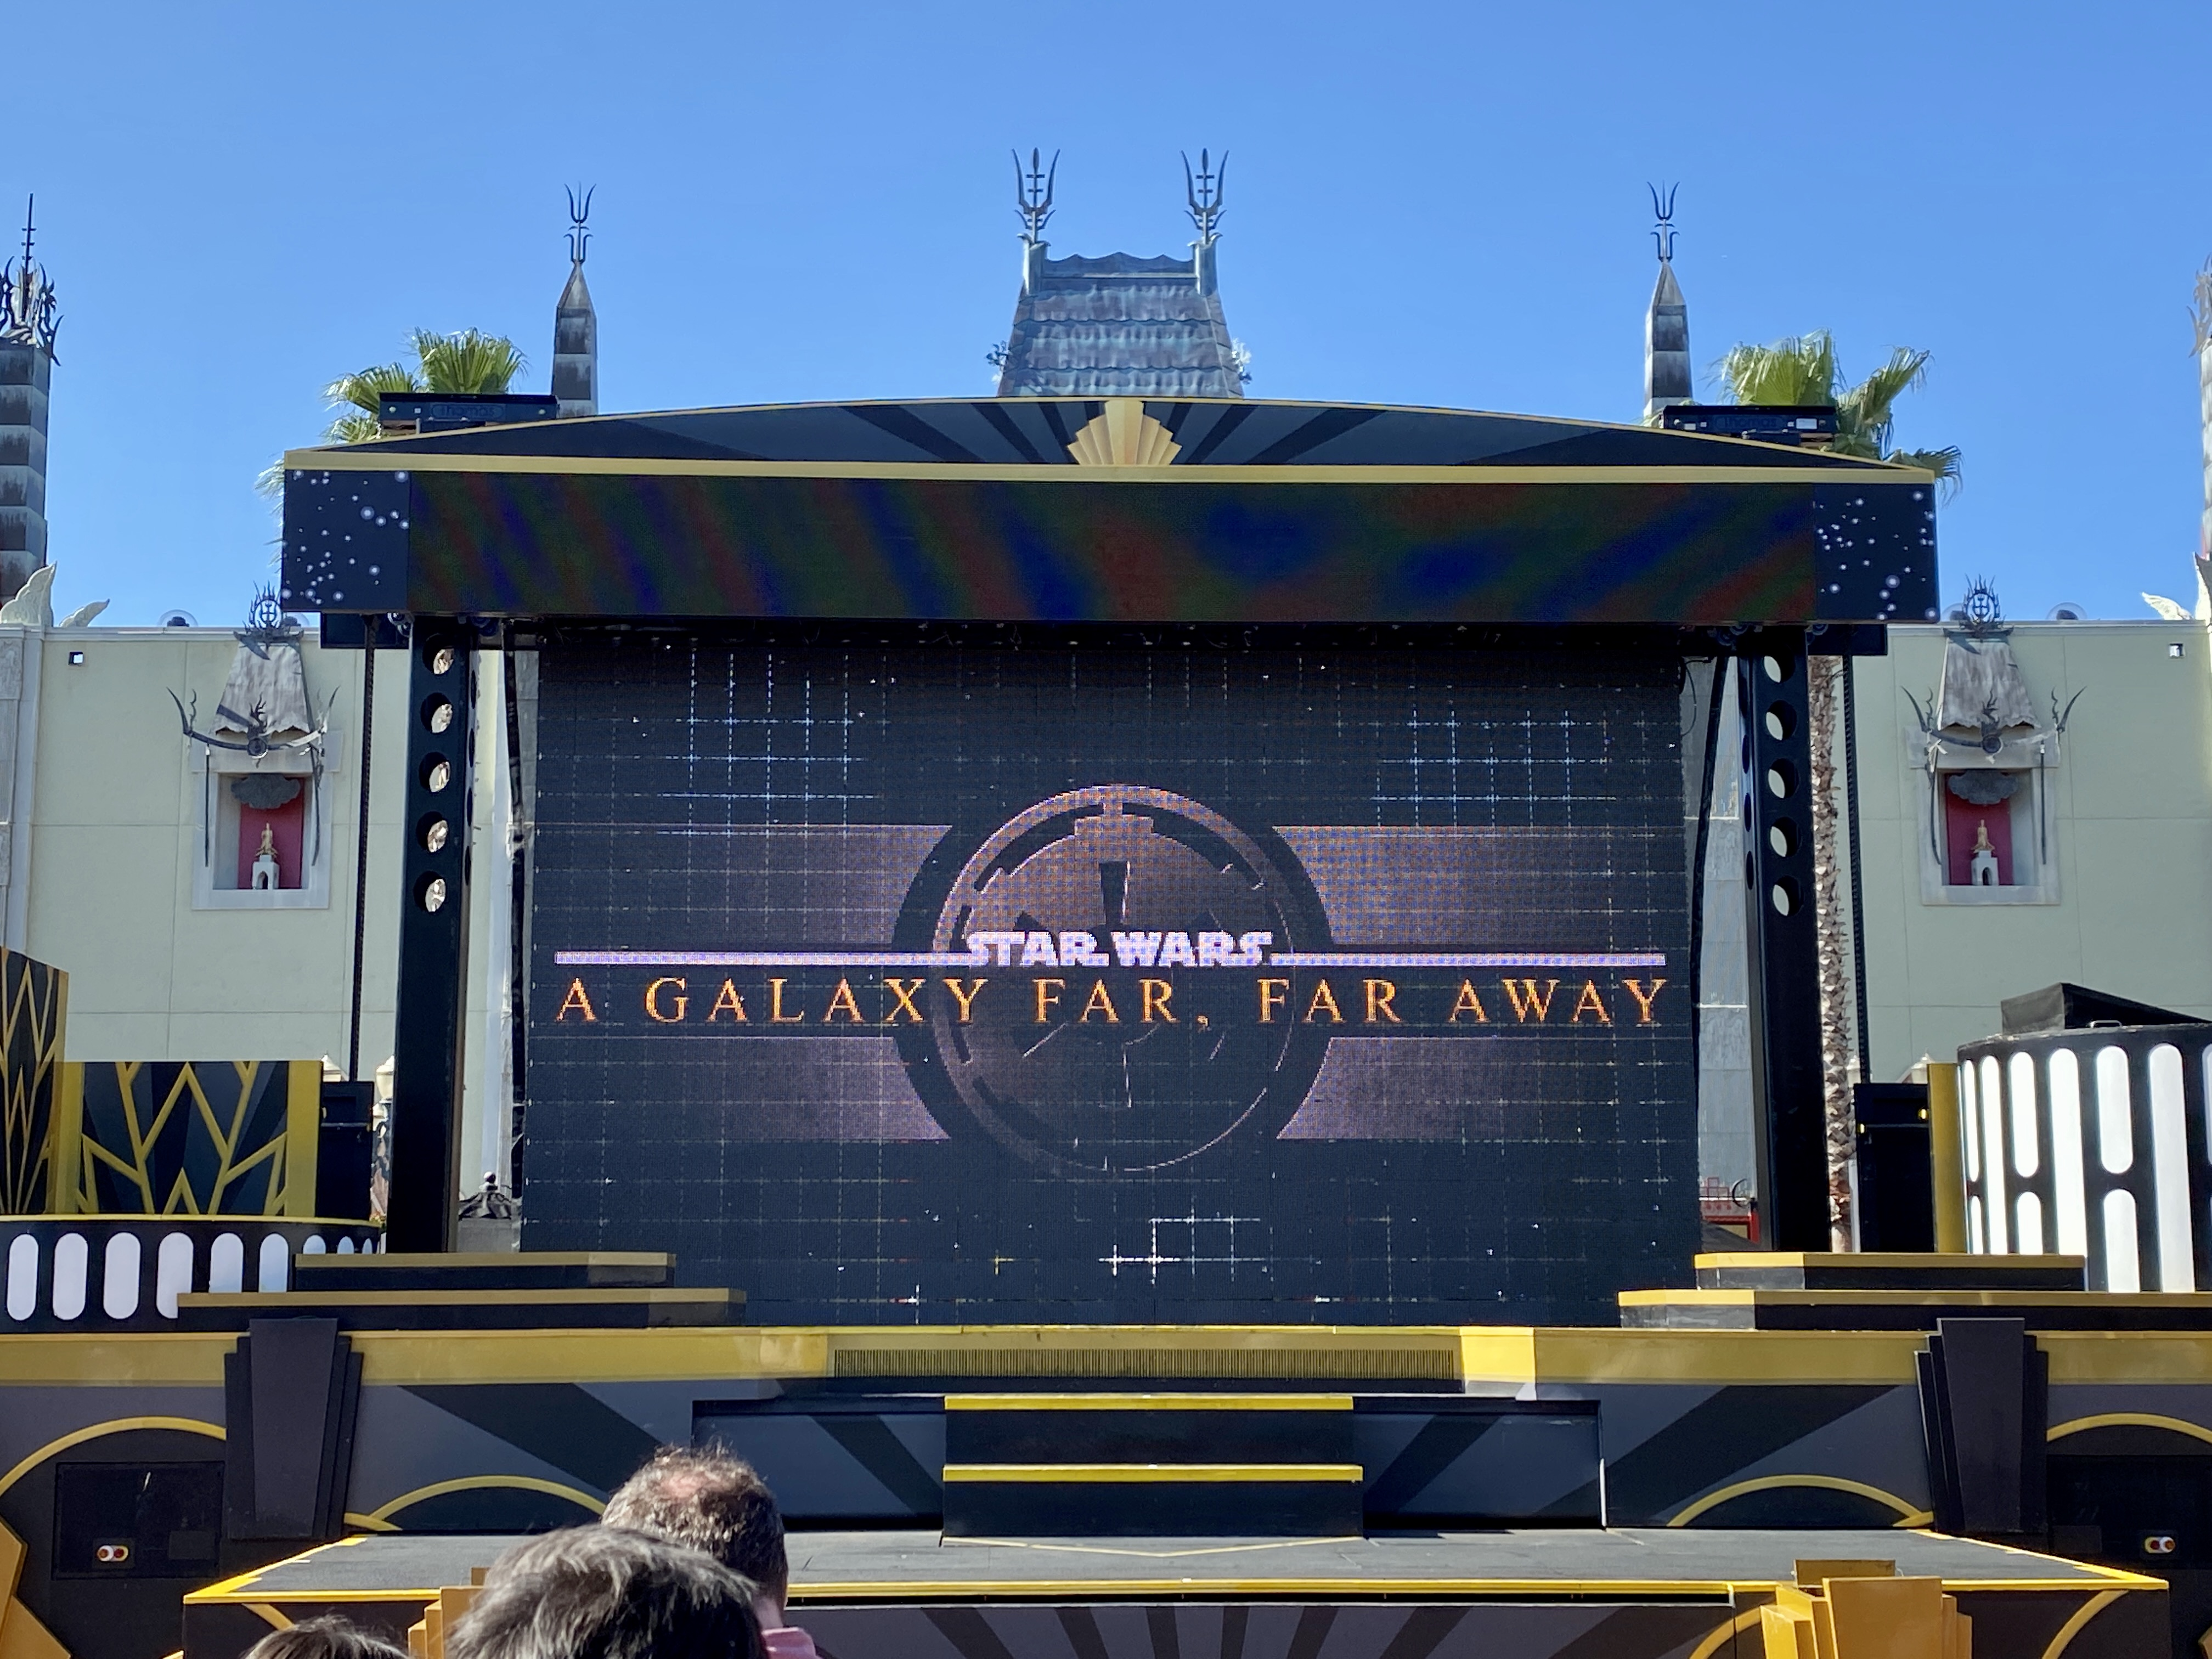 Star Wars galaxy far far away